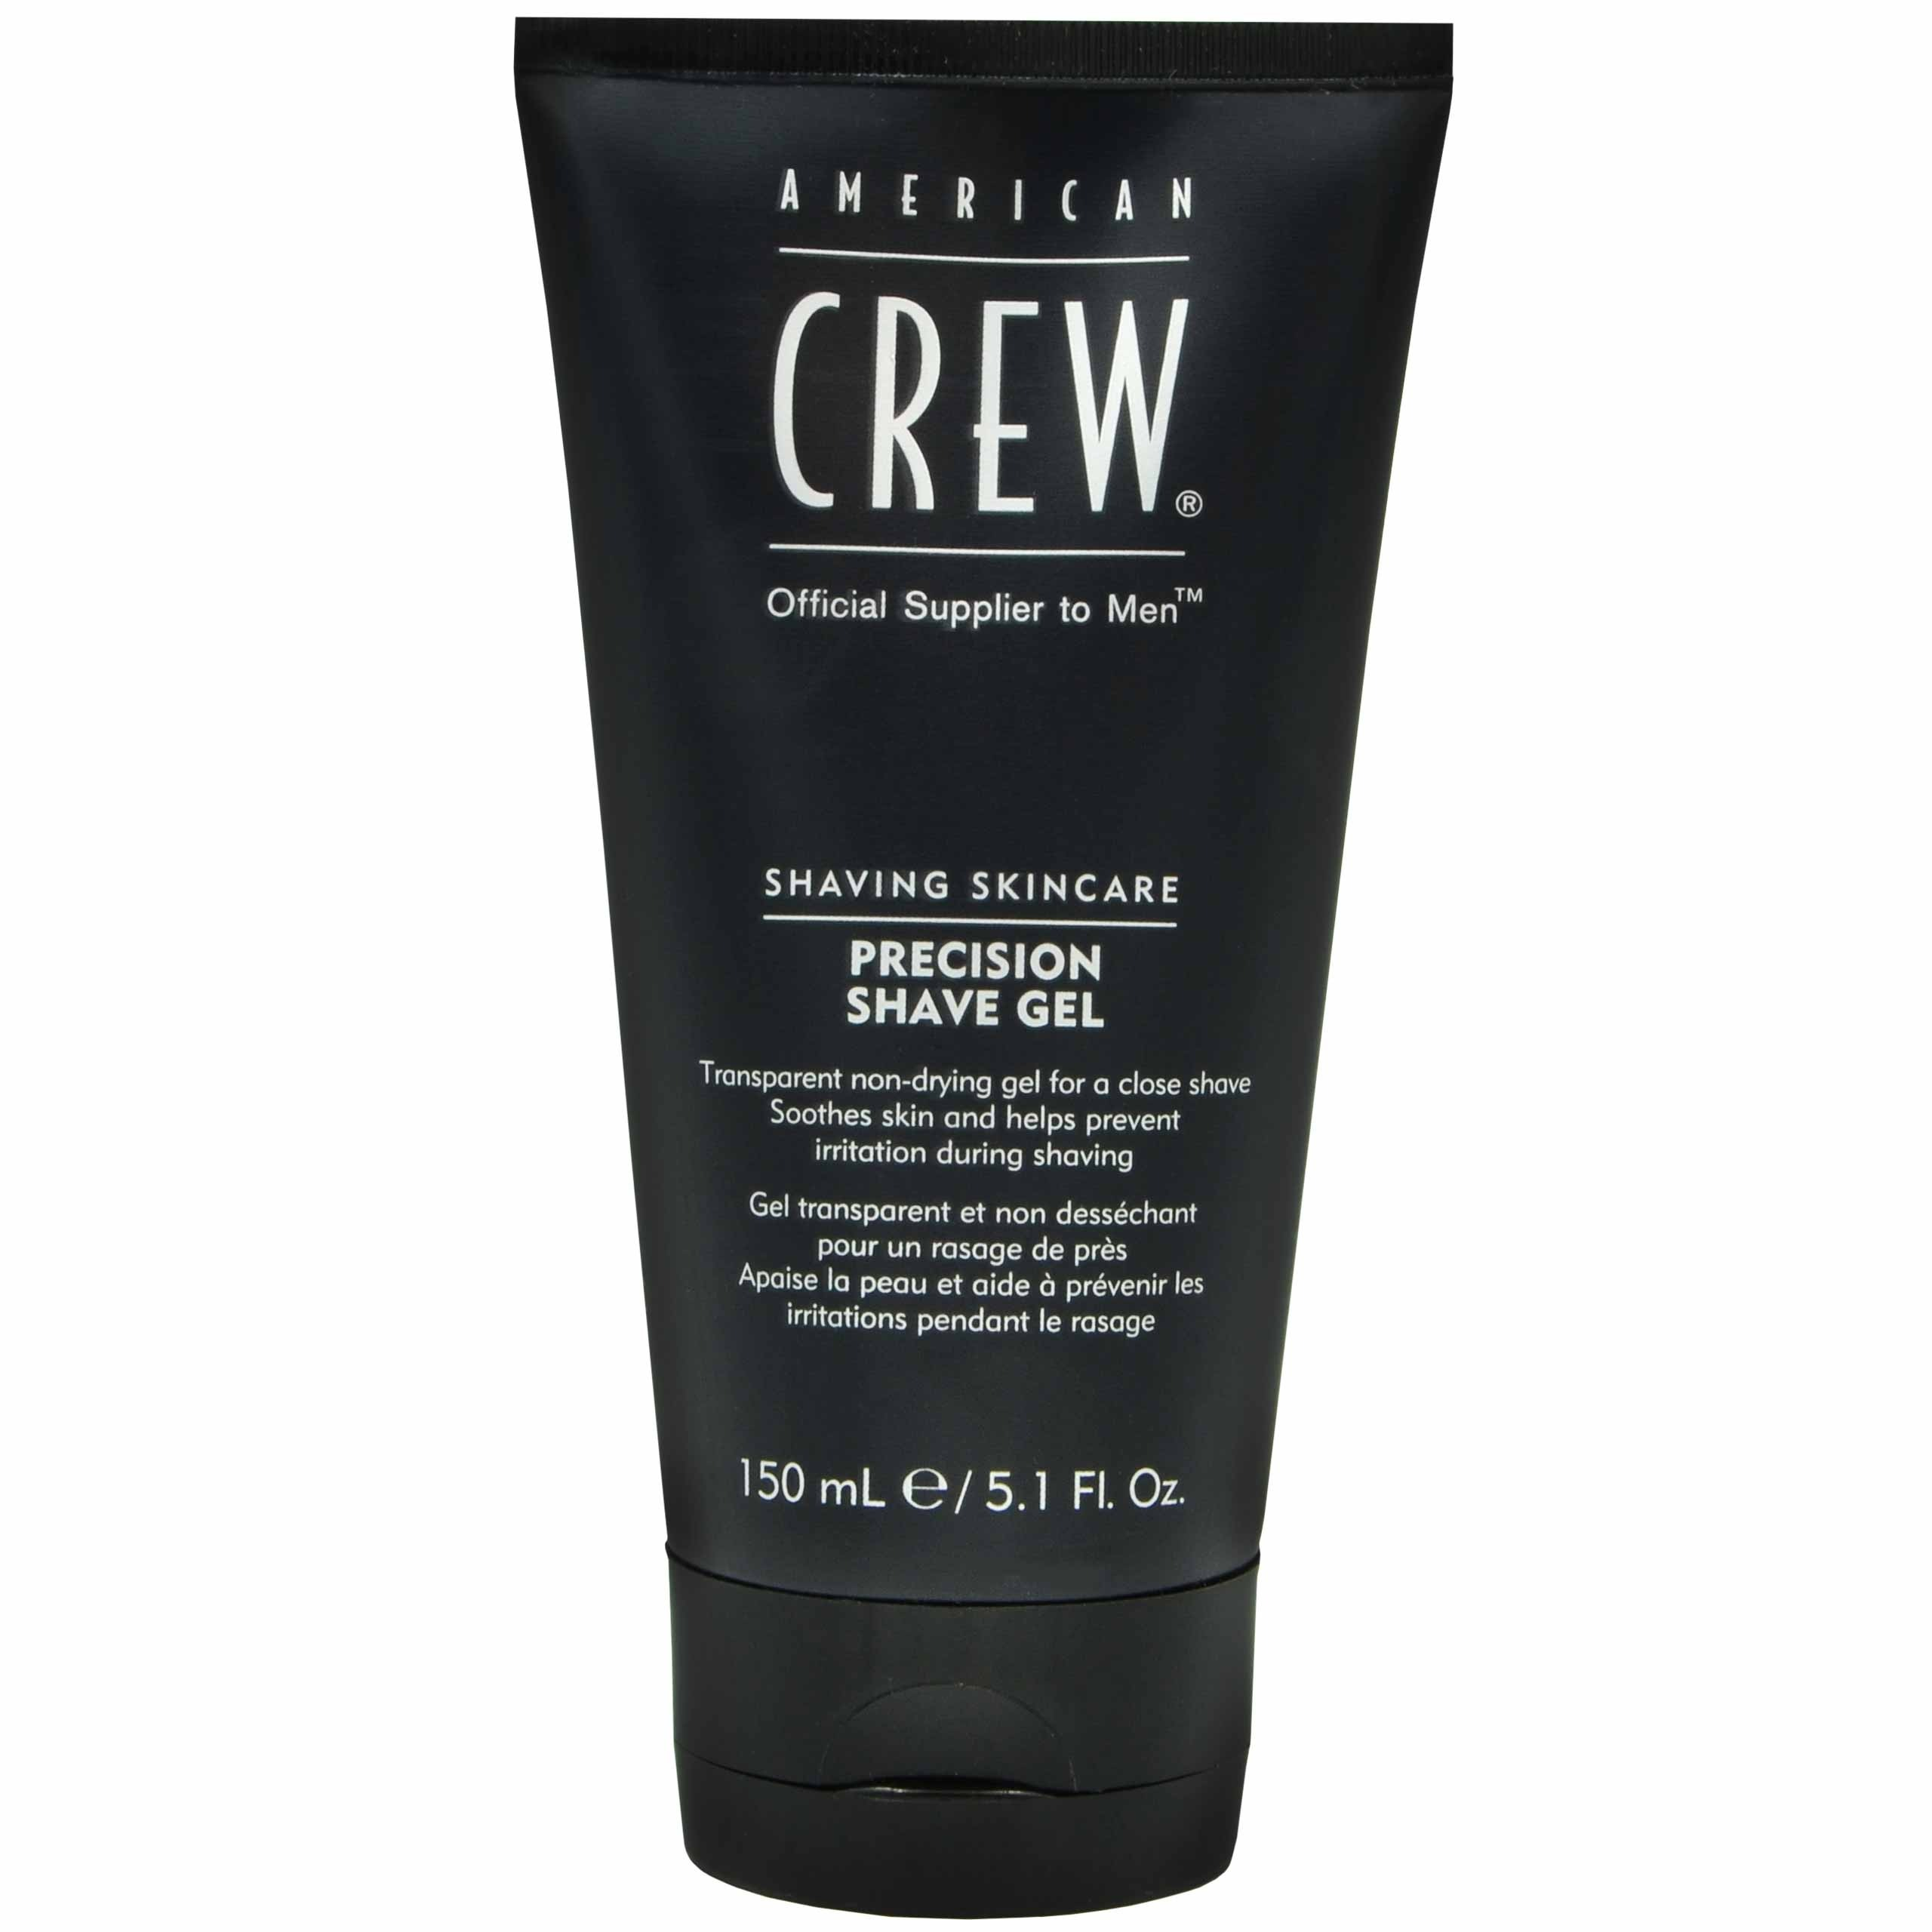 Image of American crew precision shave gel żel do golenia dla mężczyzn 150ml